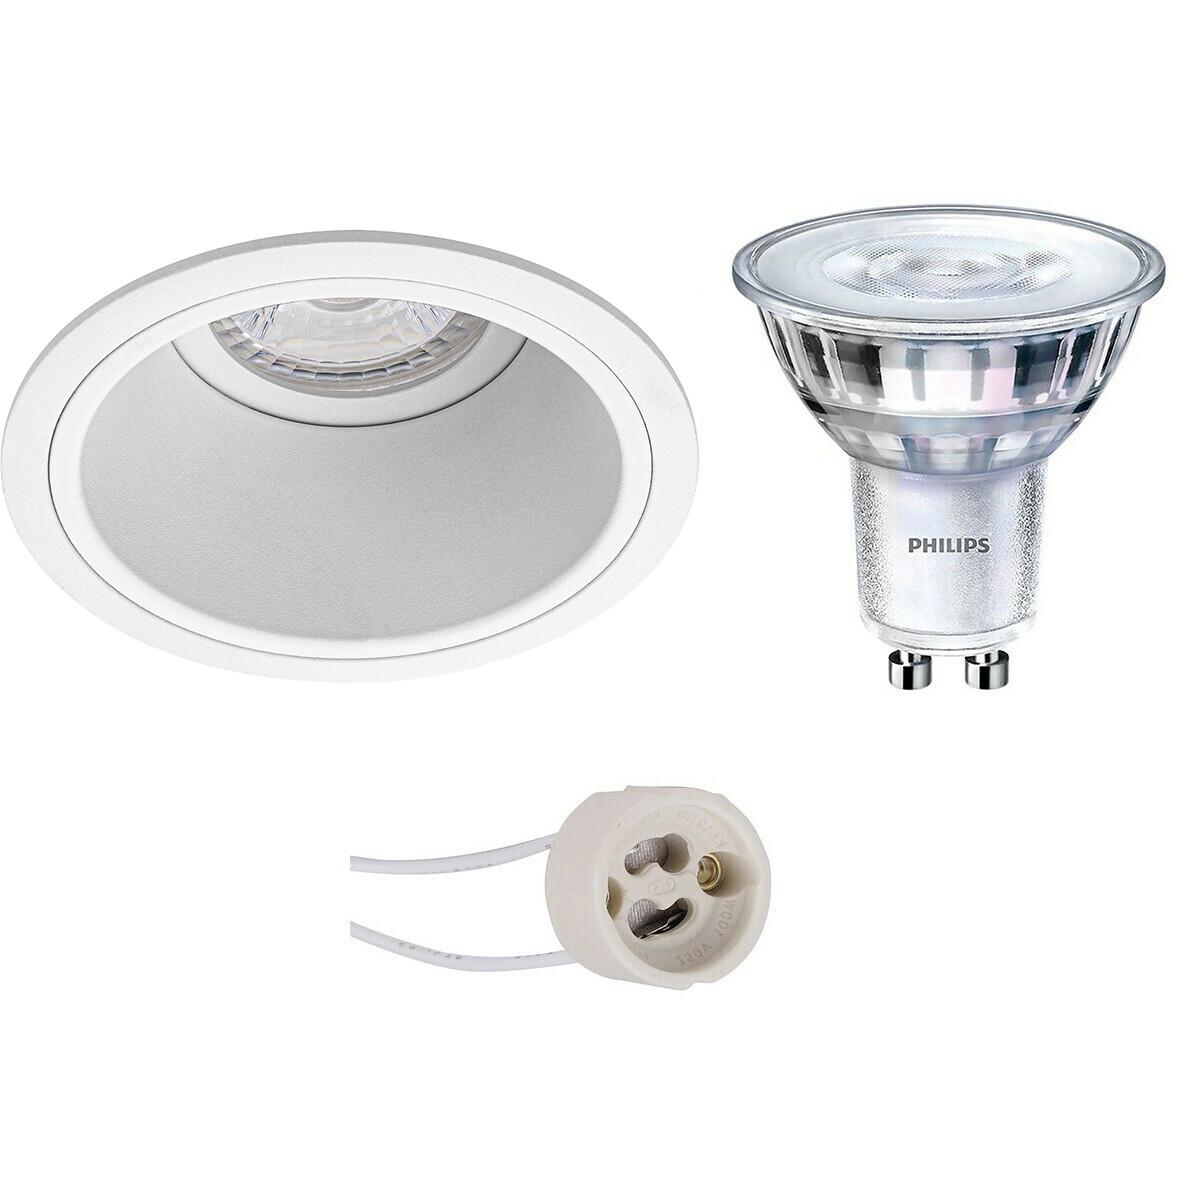 PHILIPS - LED Spot Set - SceneSwitch 827 36D - Pragmi Minko Pro - GU10 Fitting - Dimbaar - Inbouw Ro